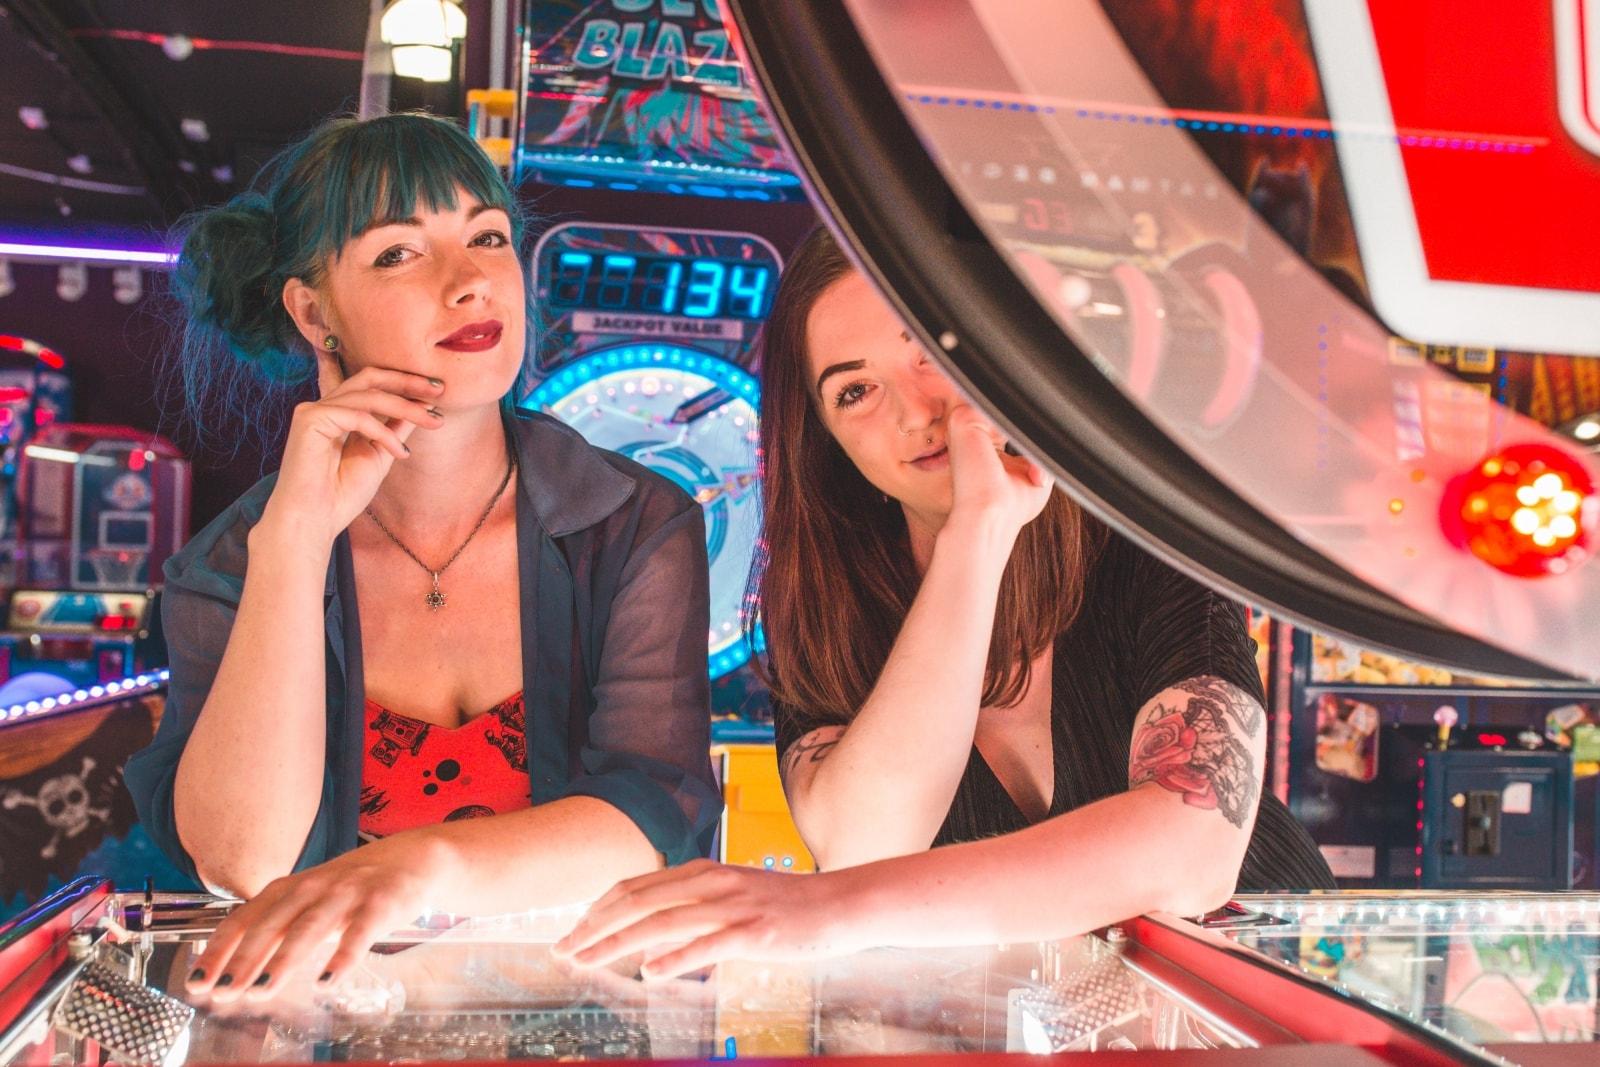 Arcade ©Leora Bermeister